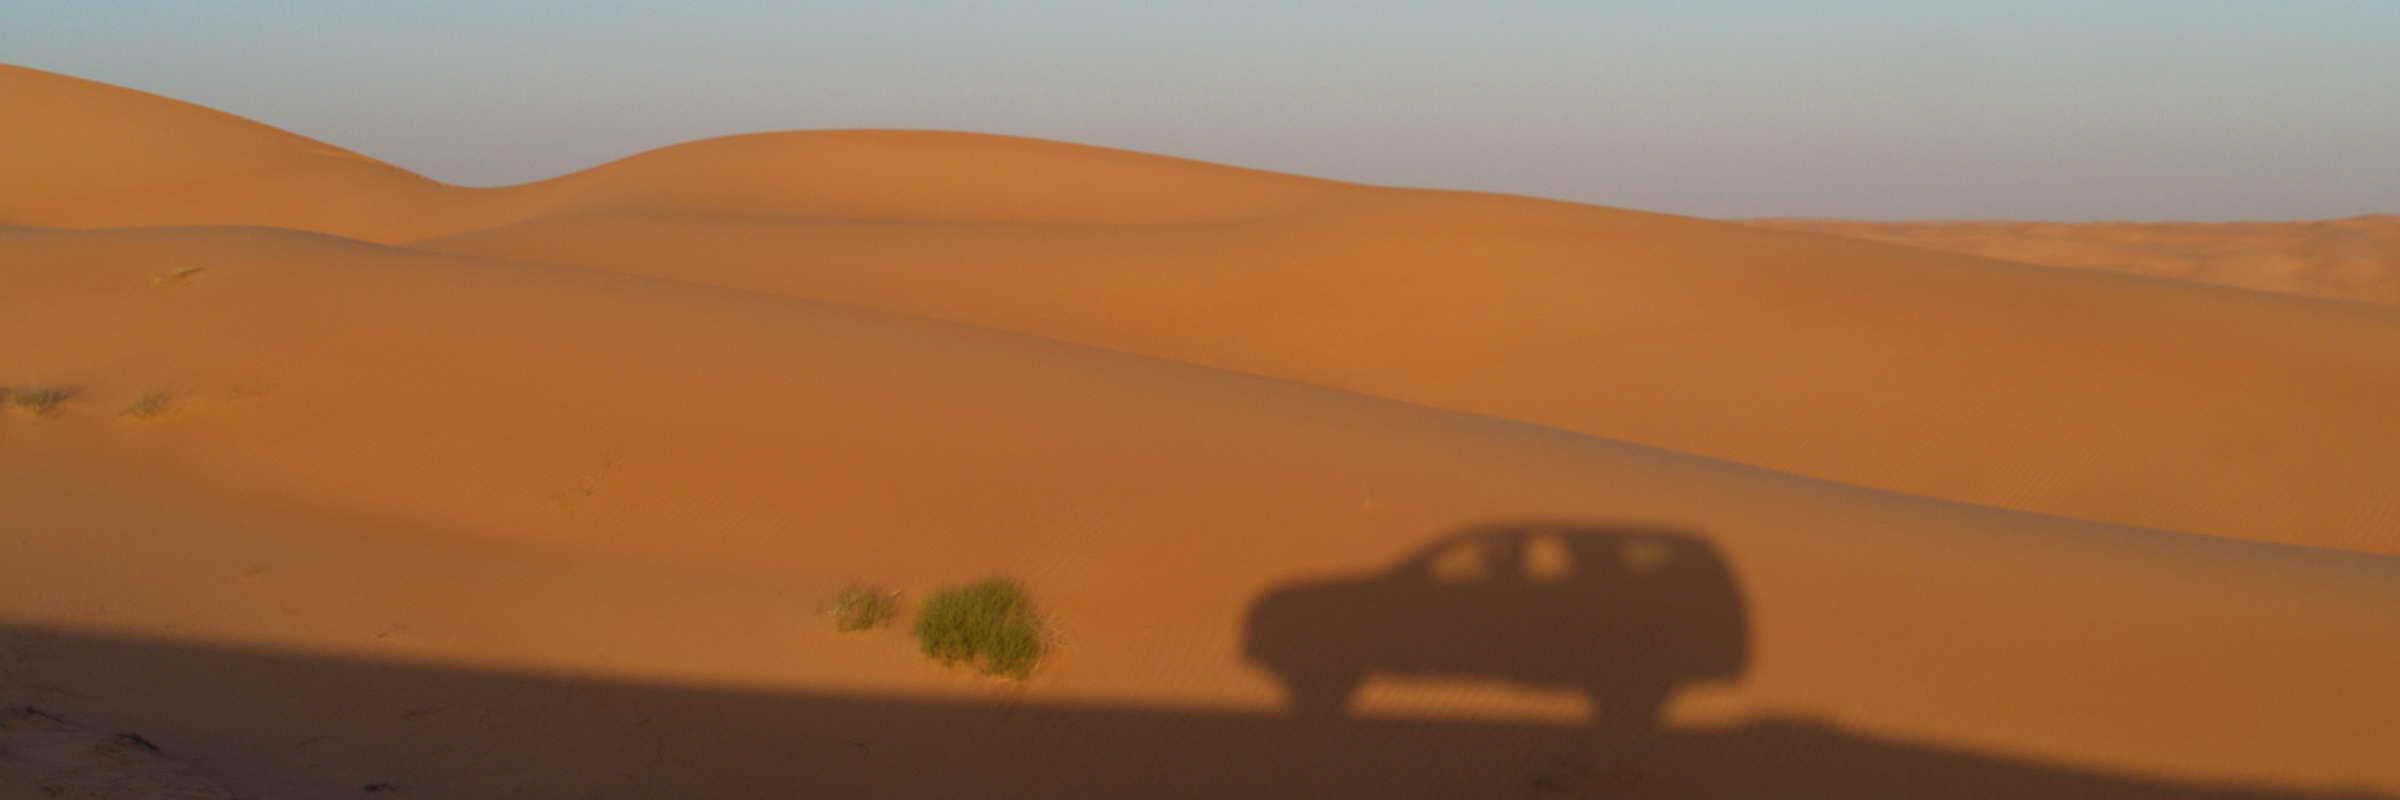 Unsere Hotels im Oman